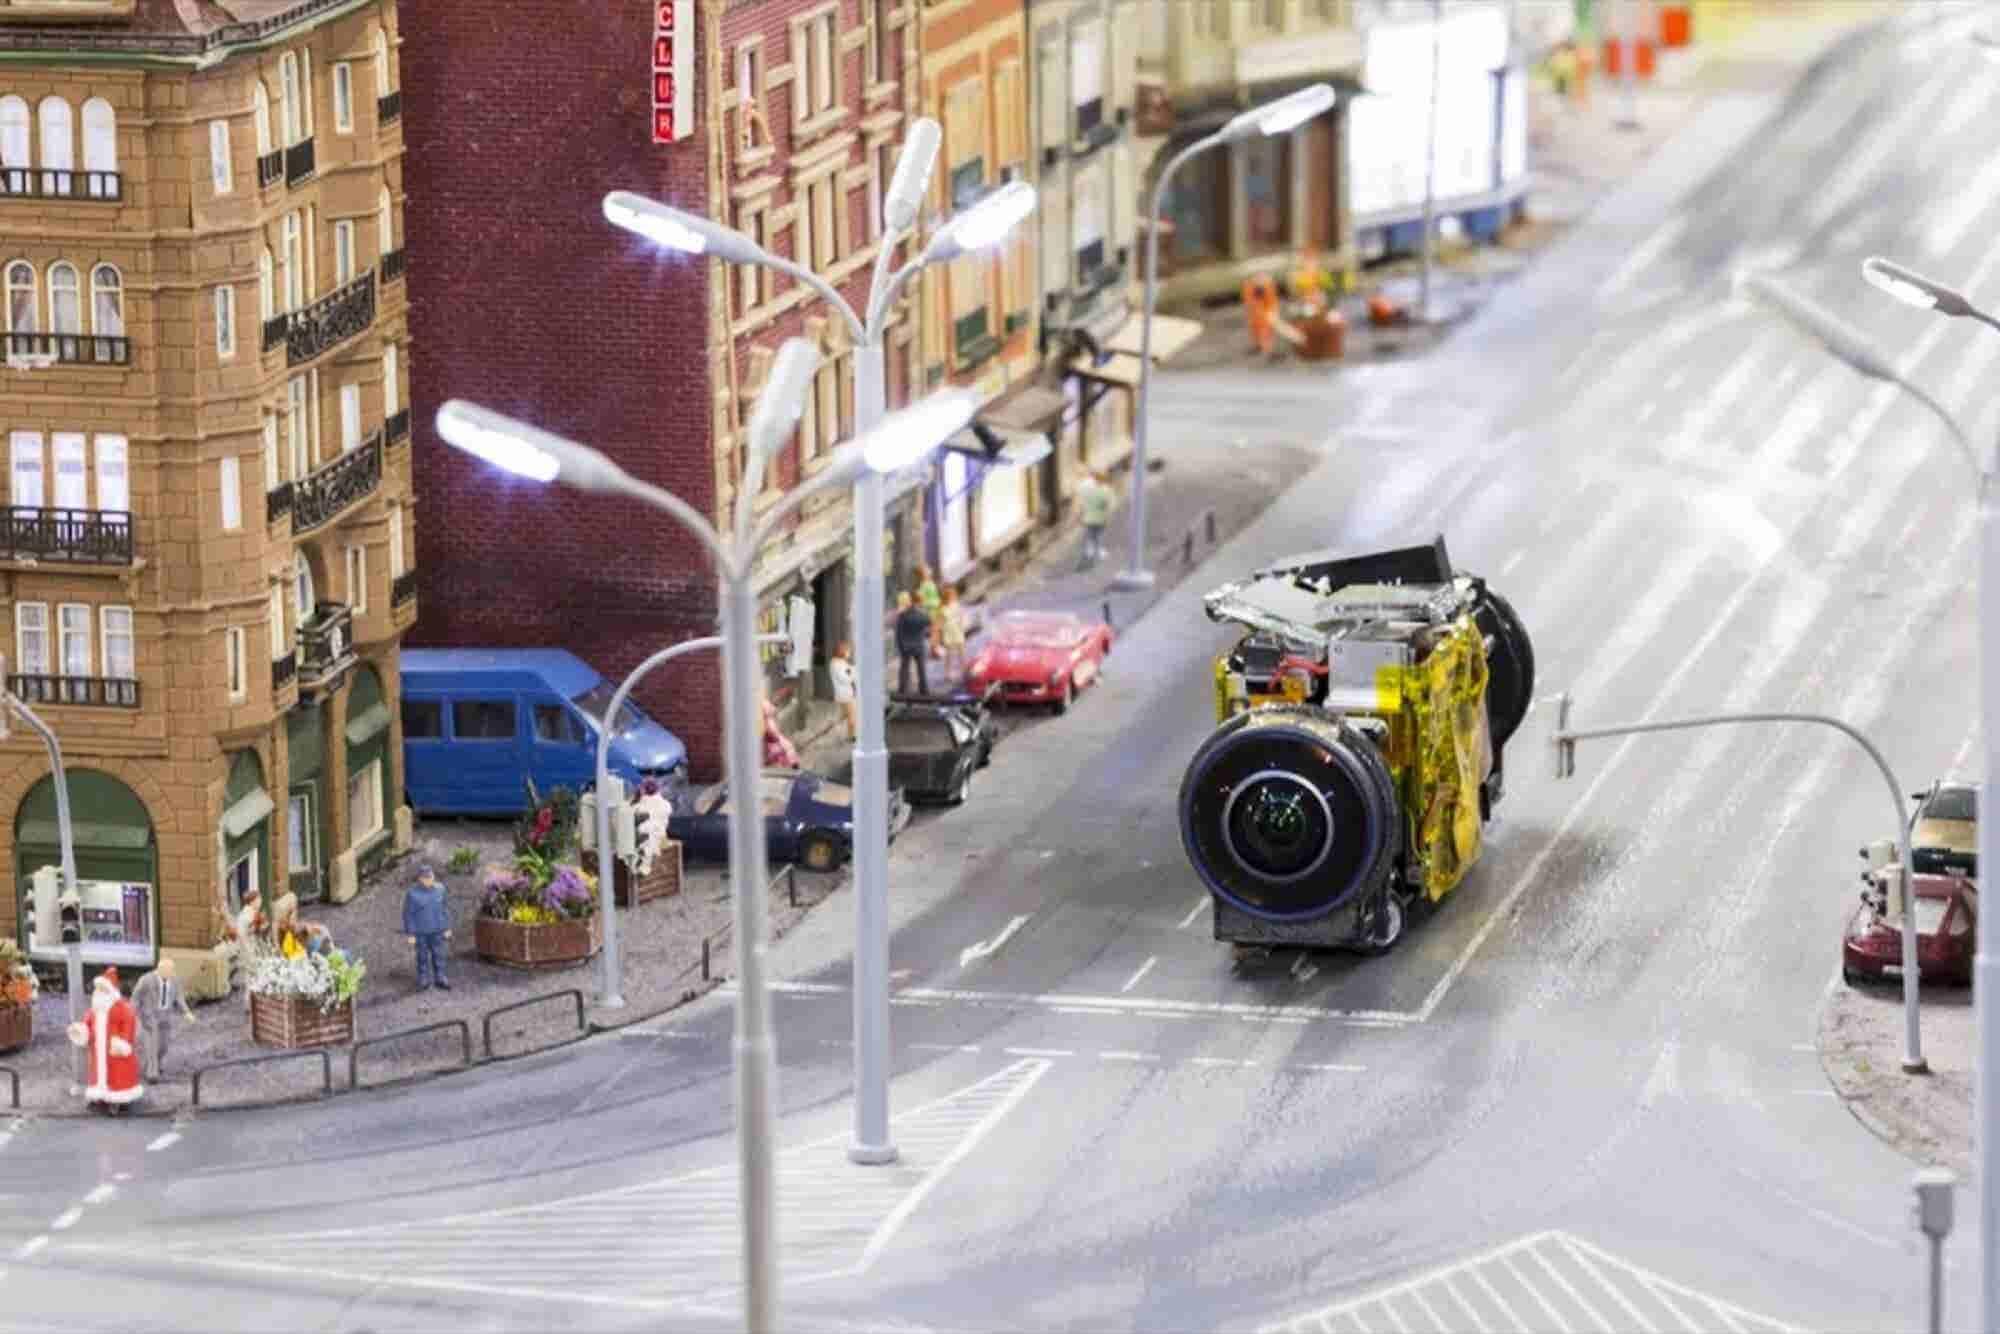 Google Uses Tiny Cameras to Capture Adorable Mini Street View